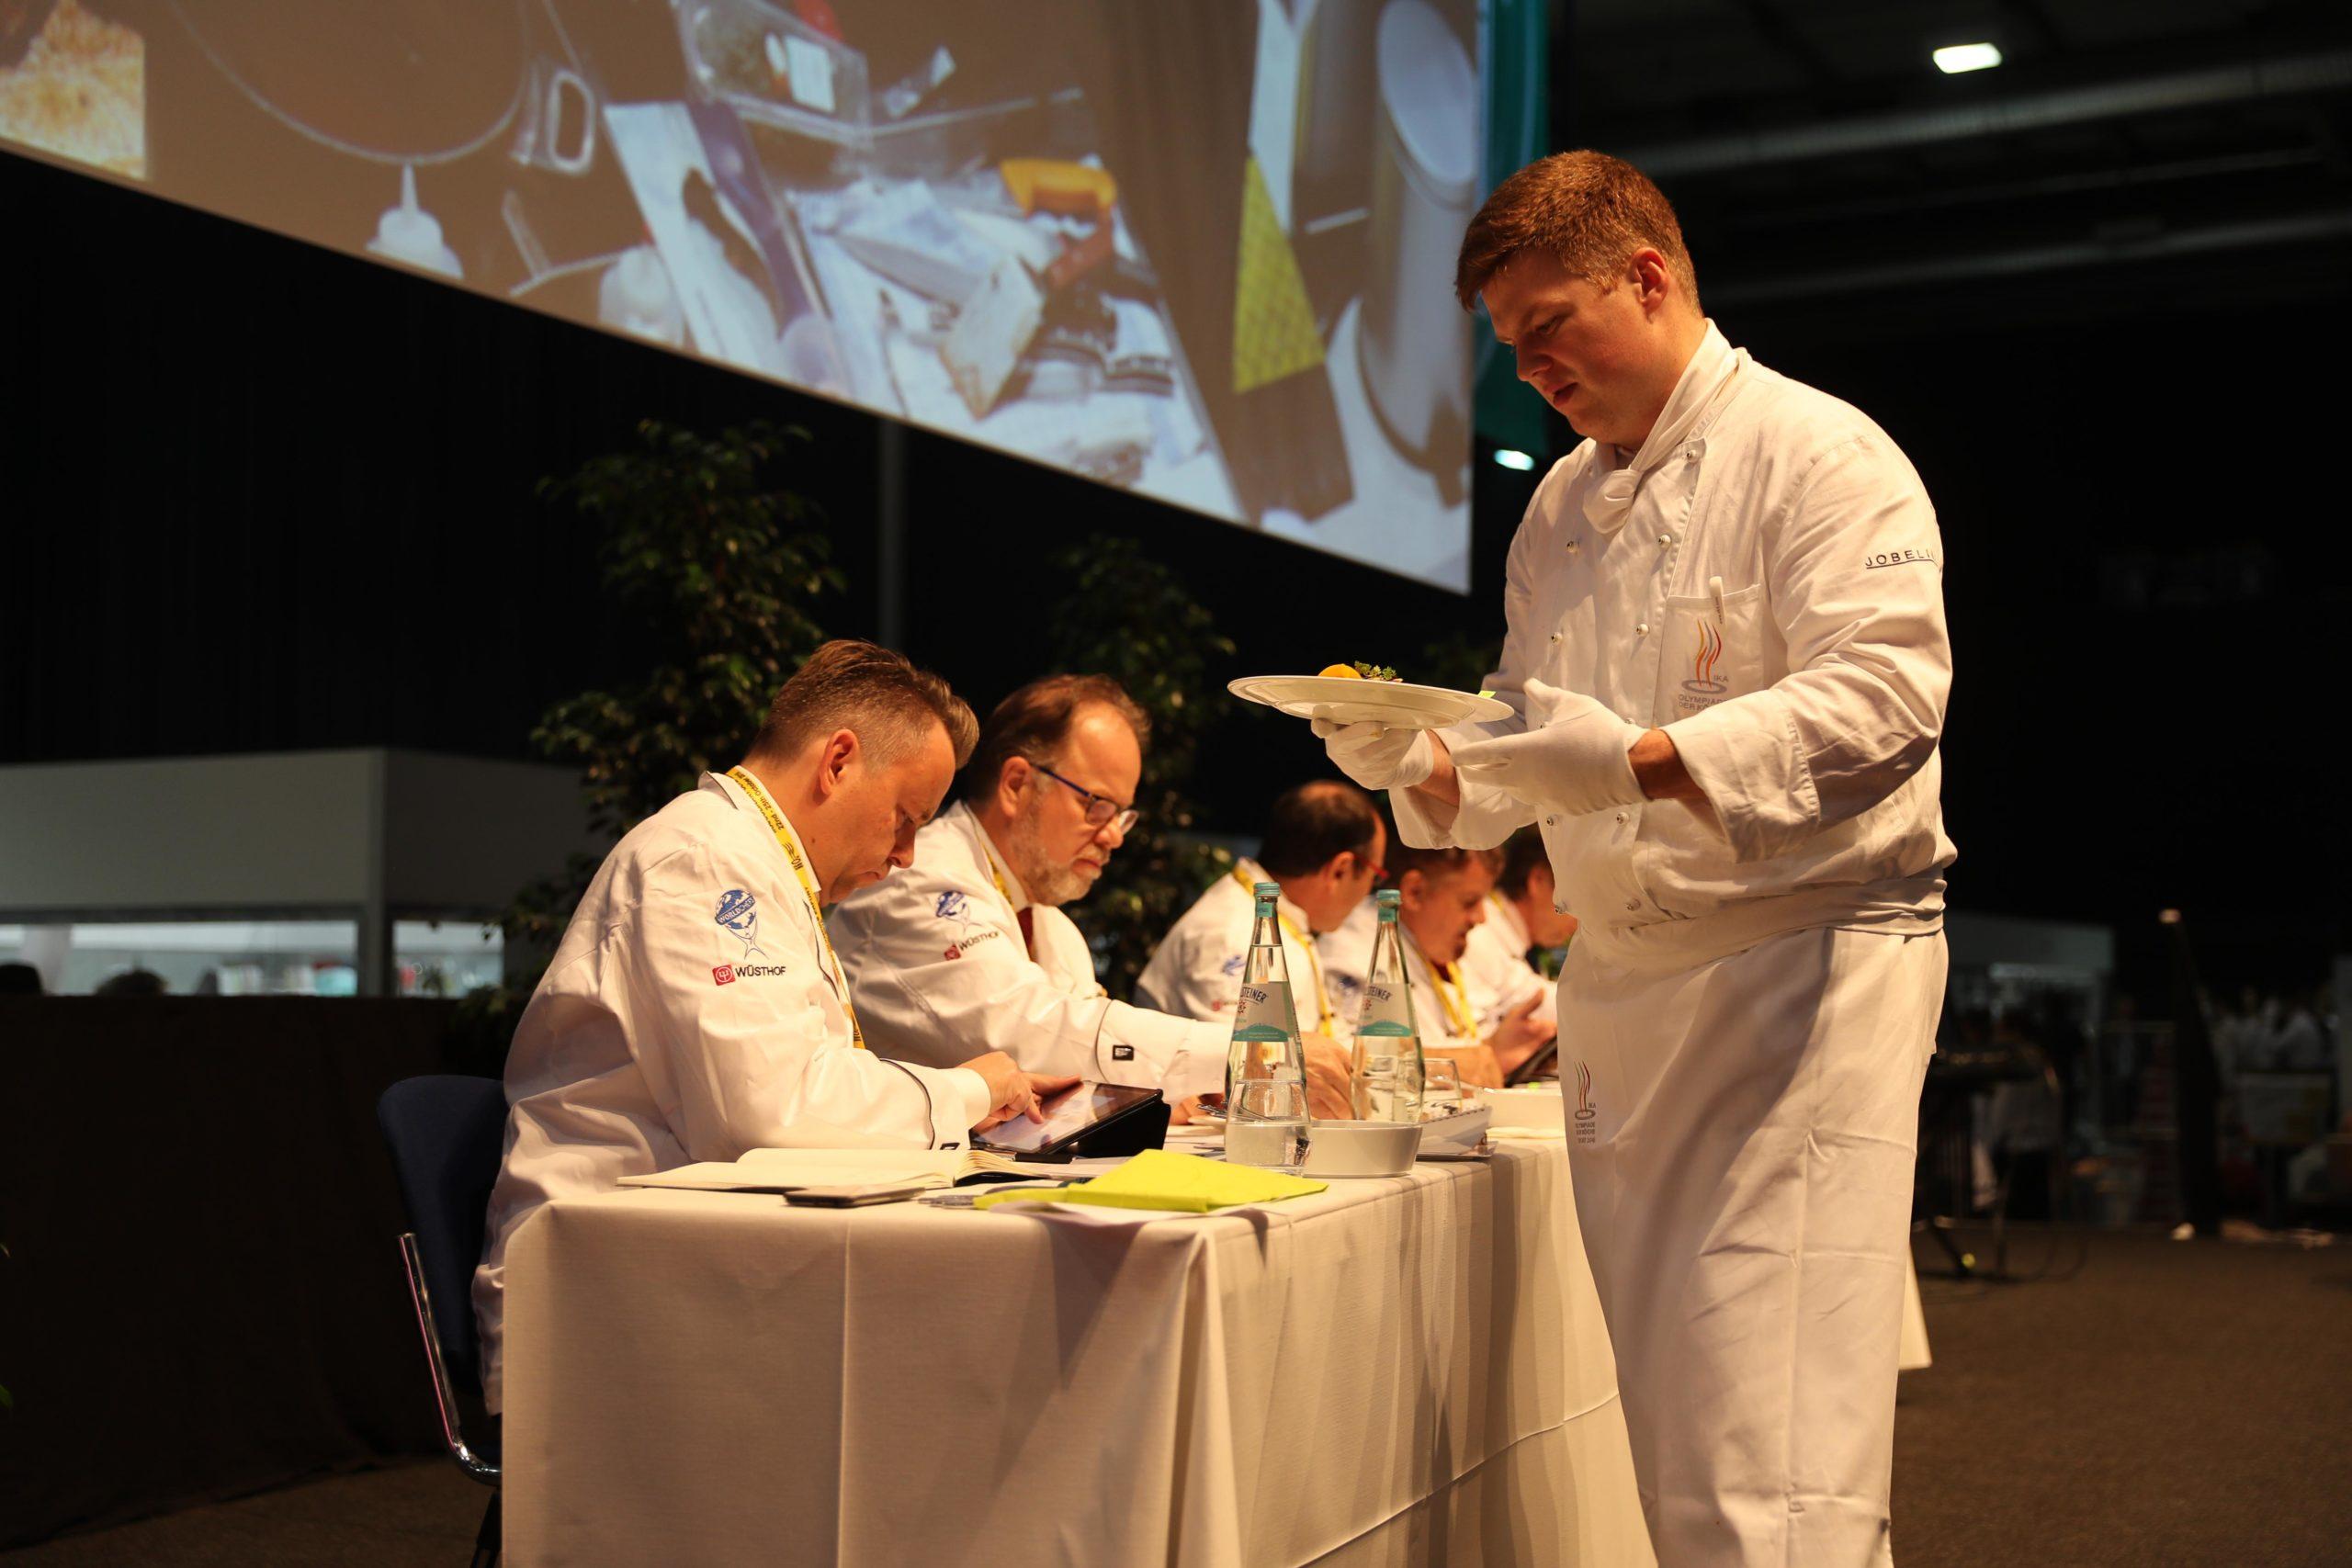 Auch auf den Geschmack kommt es an. Foto: IKA/Culinary Olympics